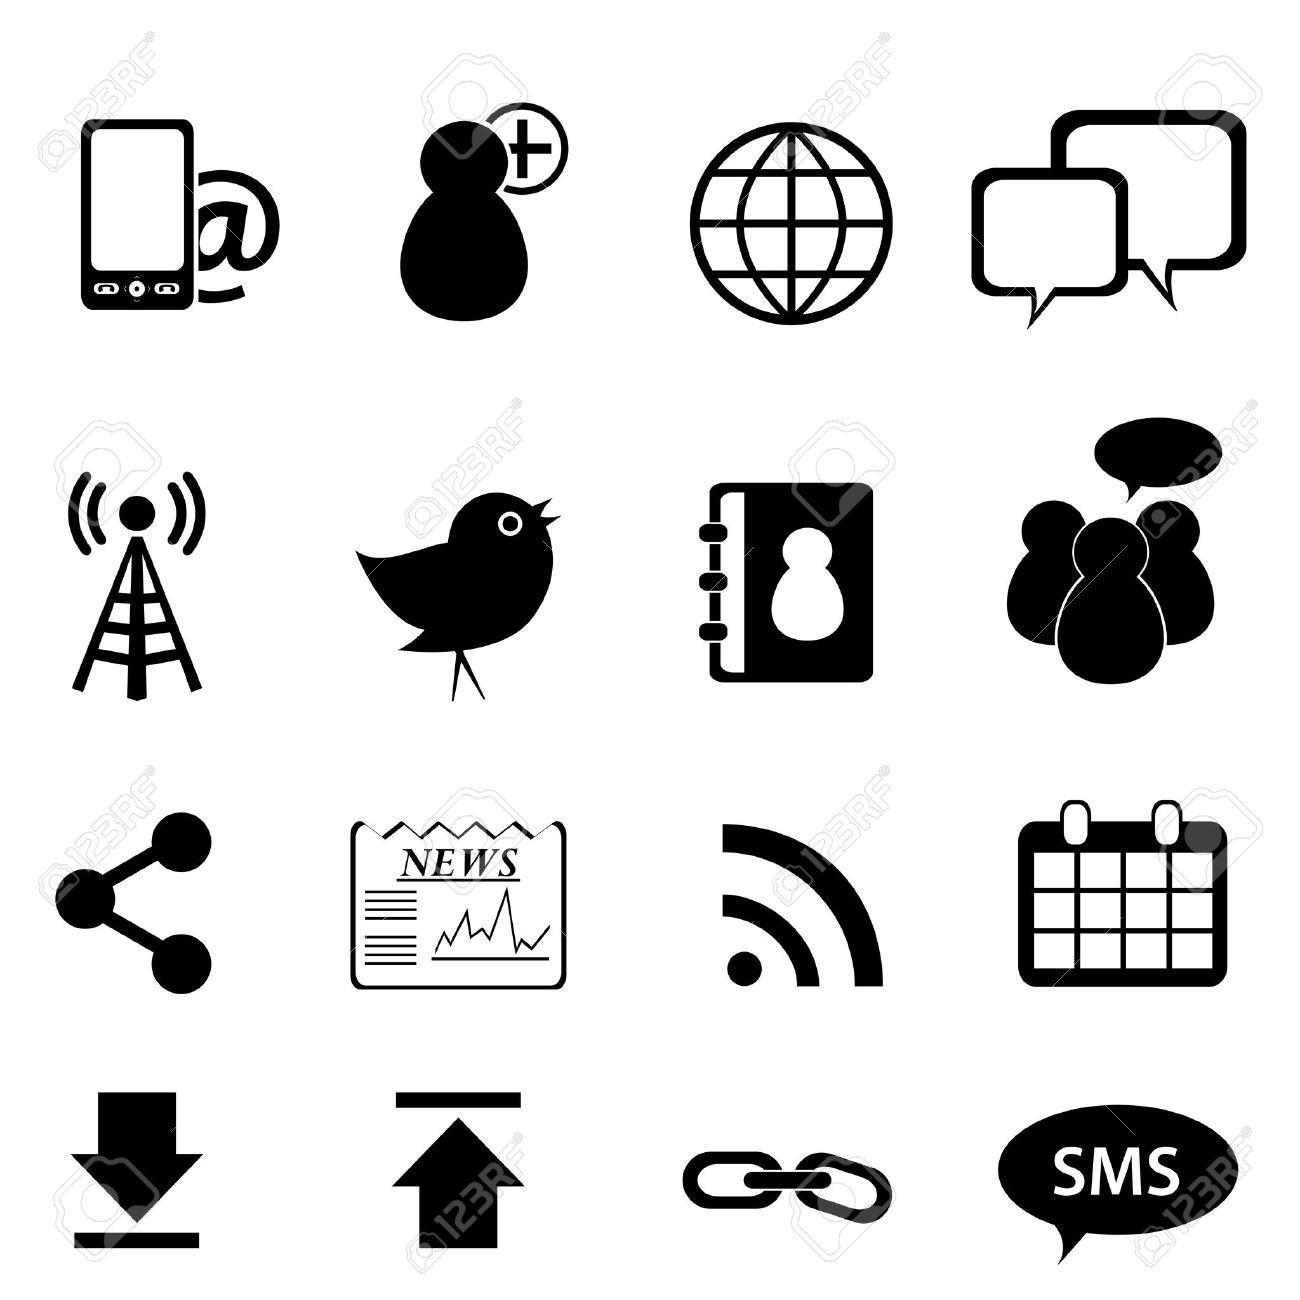 Social Network And Media Icon Set Royalty Free Cliparts, Vectors.